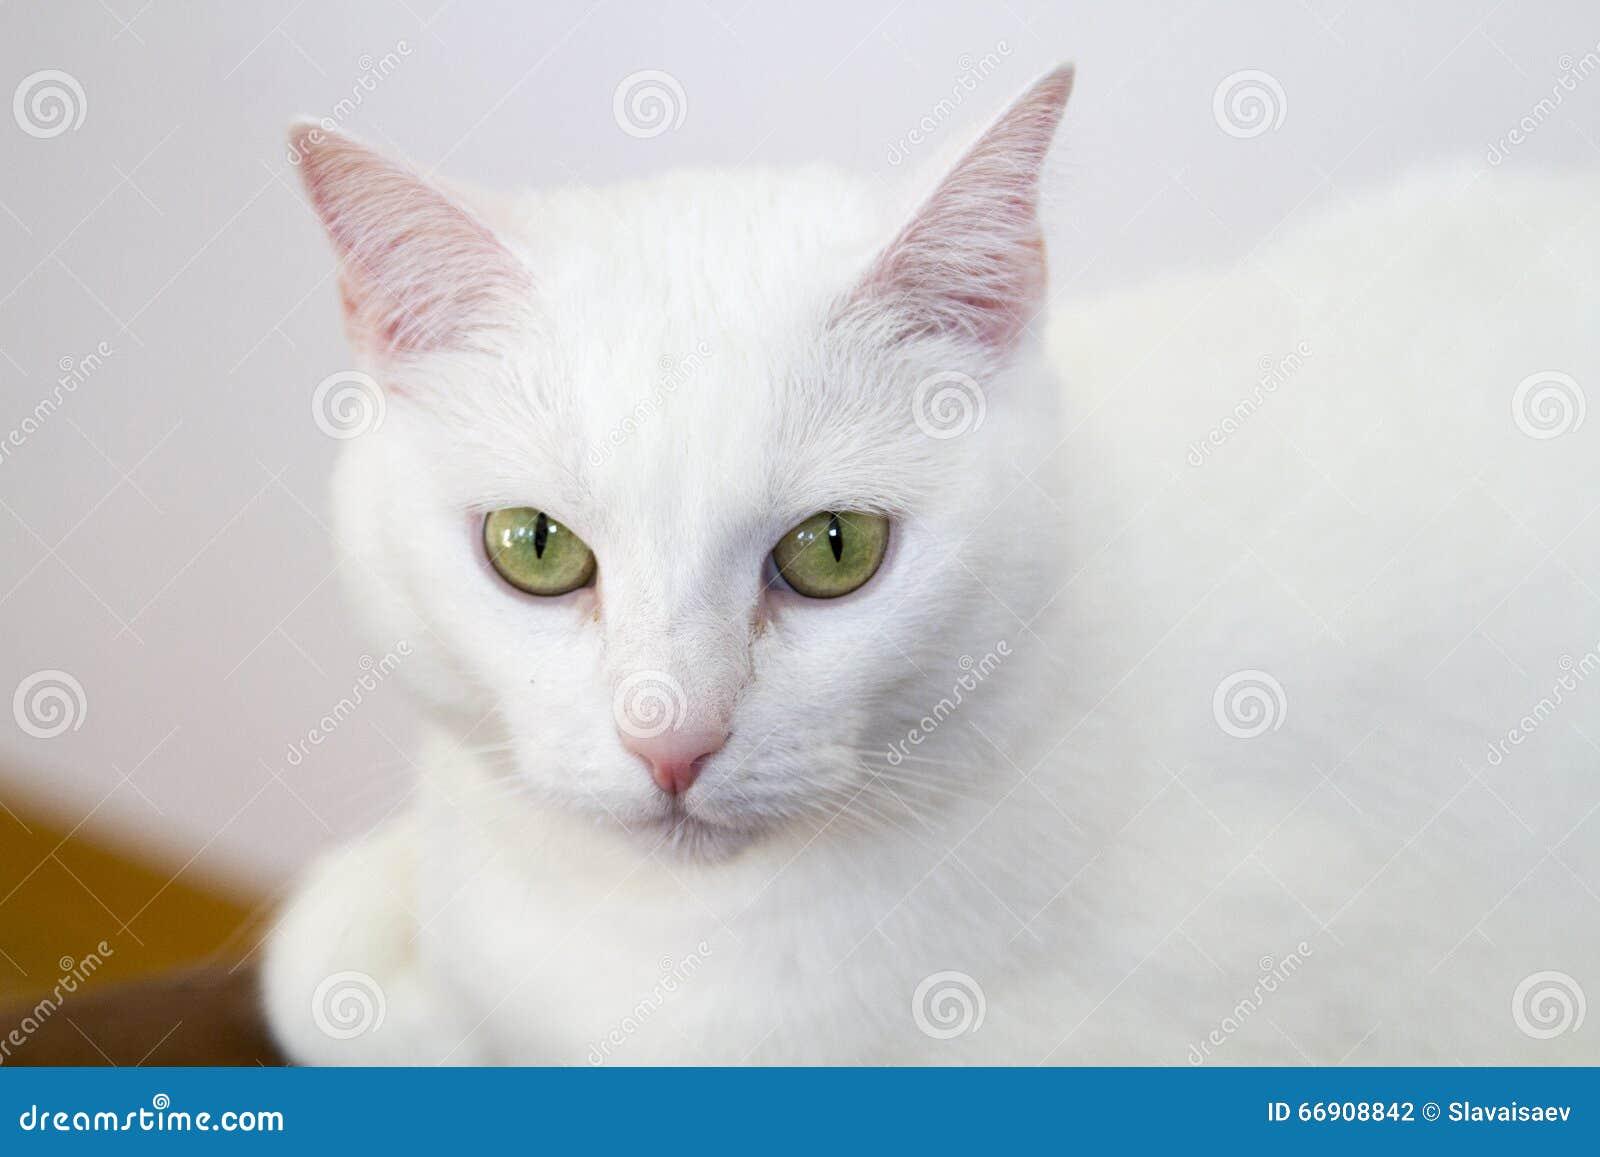 Pure White Cat Stock Photo Image Of Portrait Staring